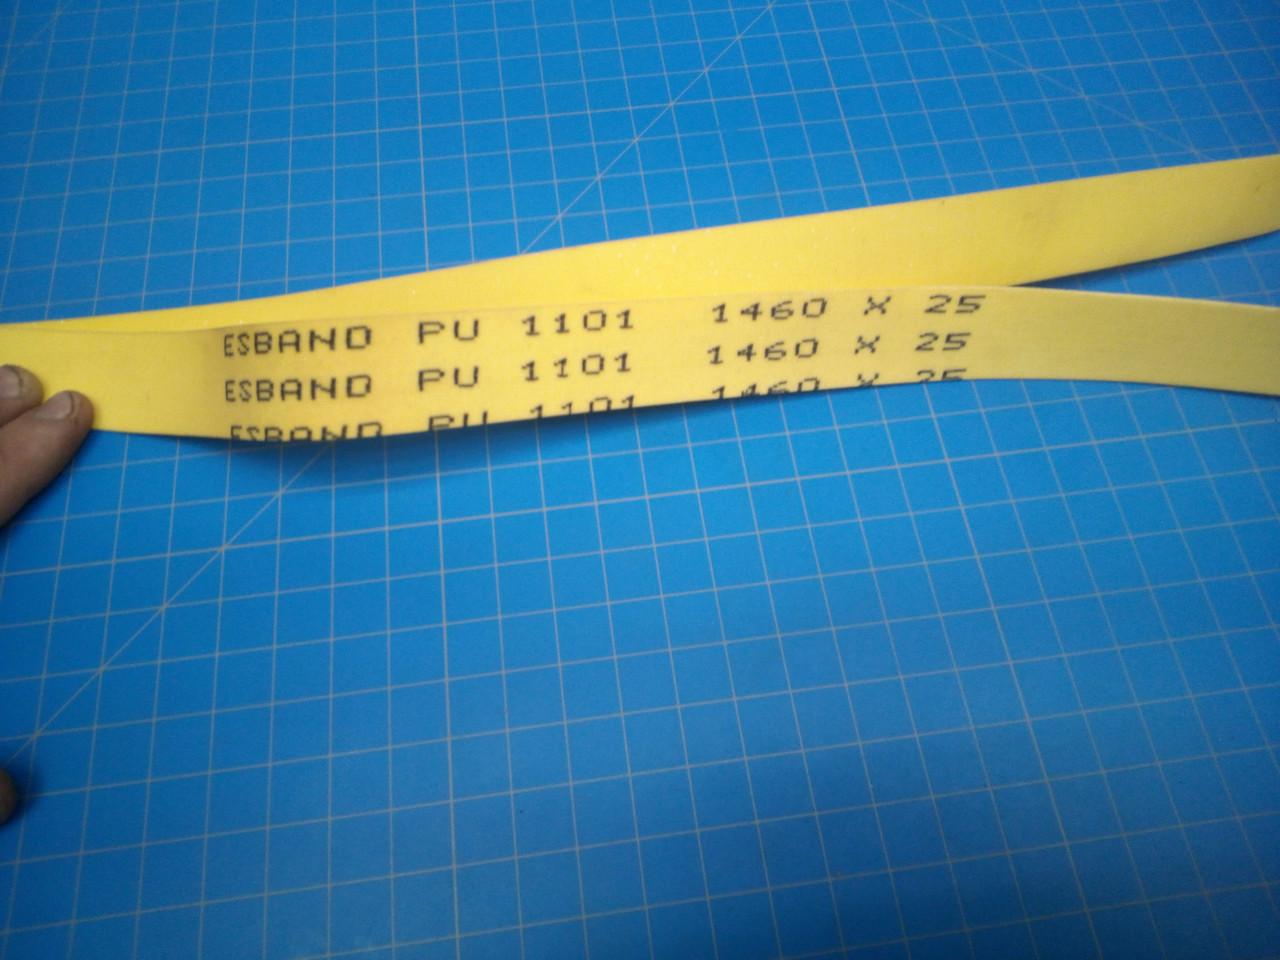 MBO B23 0106245 25 x 1460 Drive Belt (New) - P01-000041